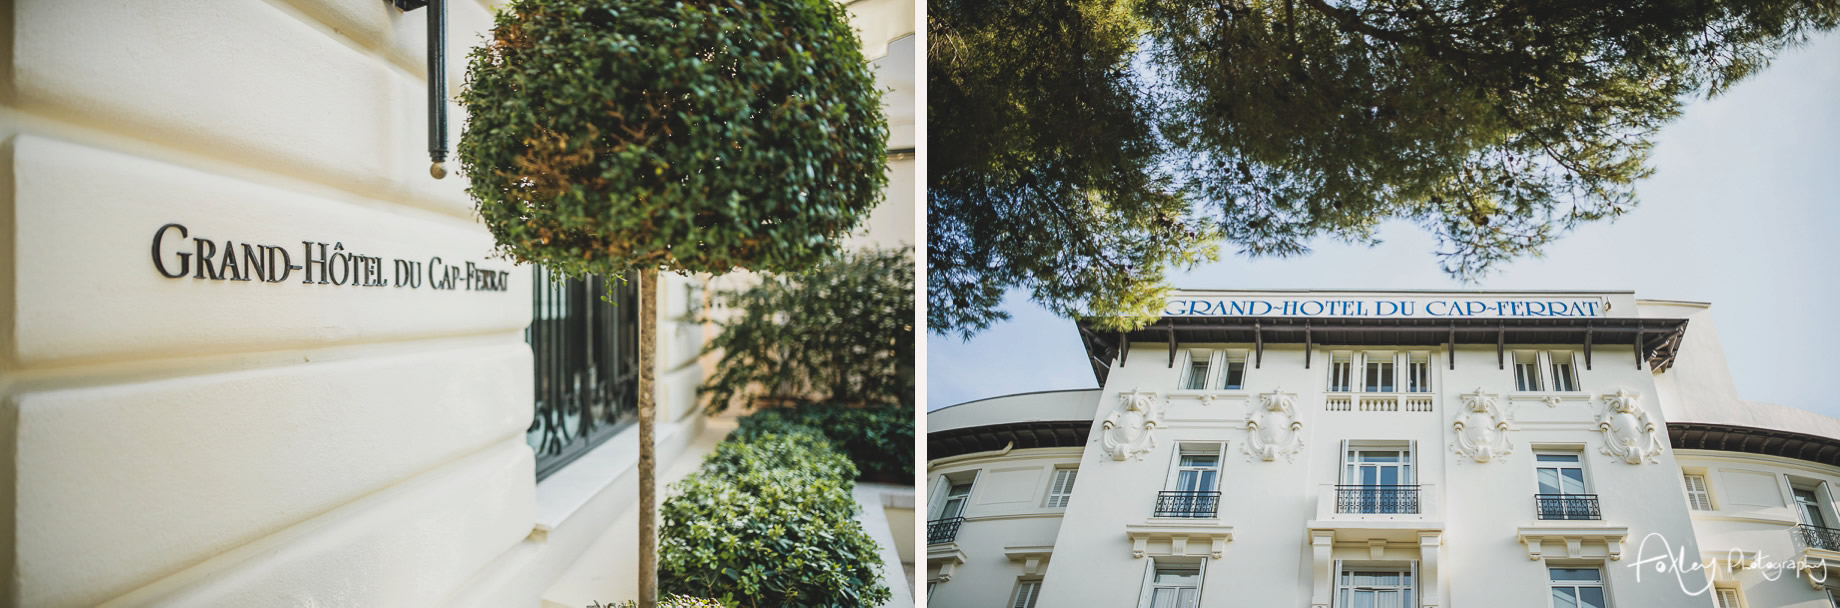 Jil and Will's Wedding at Villa Ephrussi De Rothschild 034